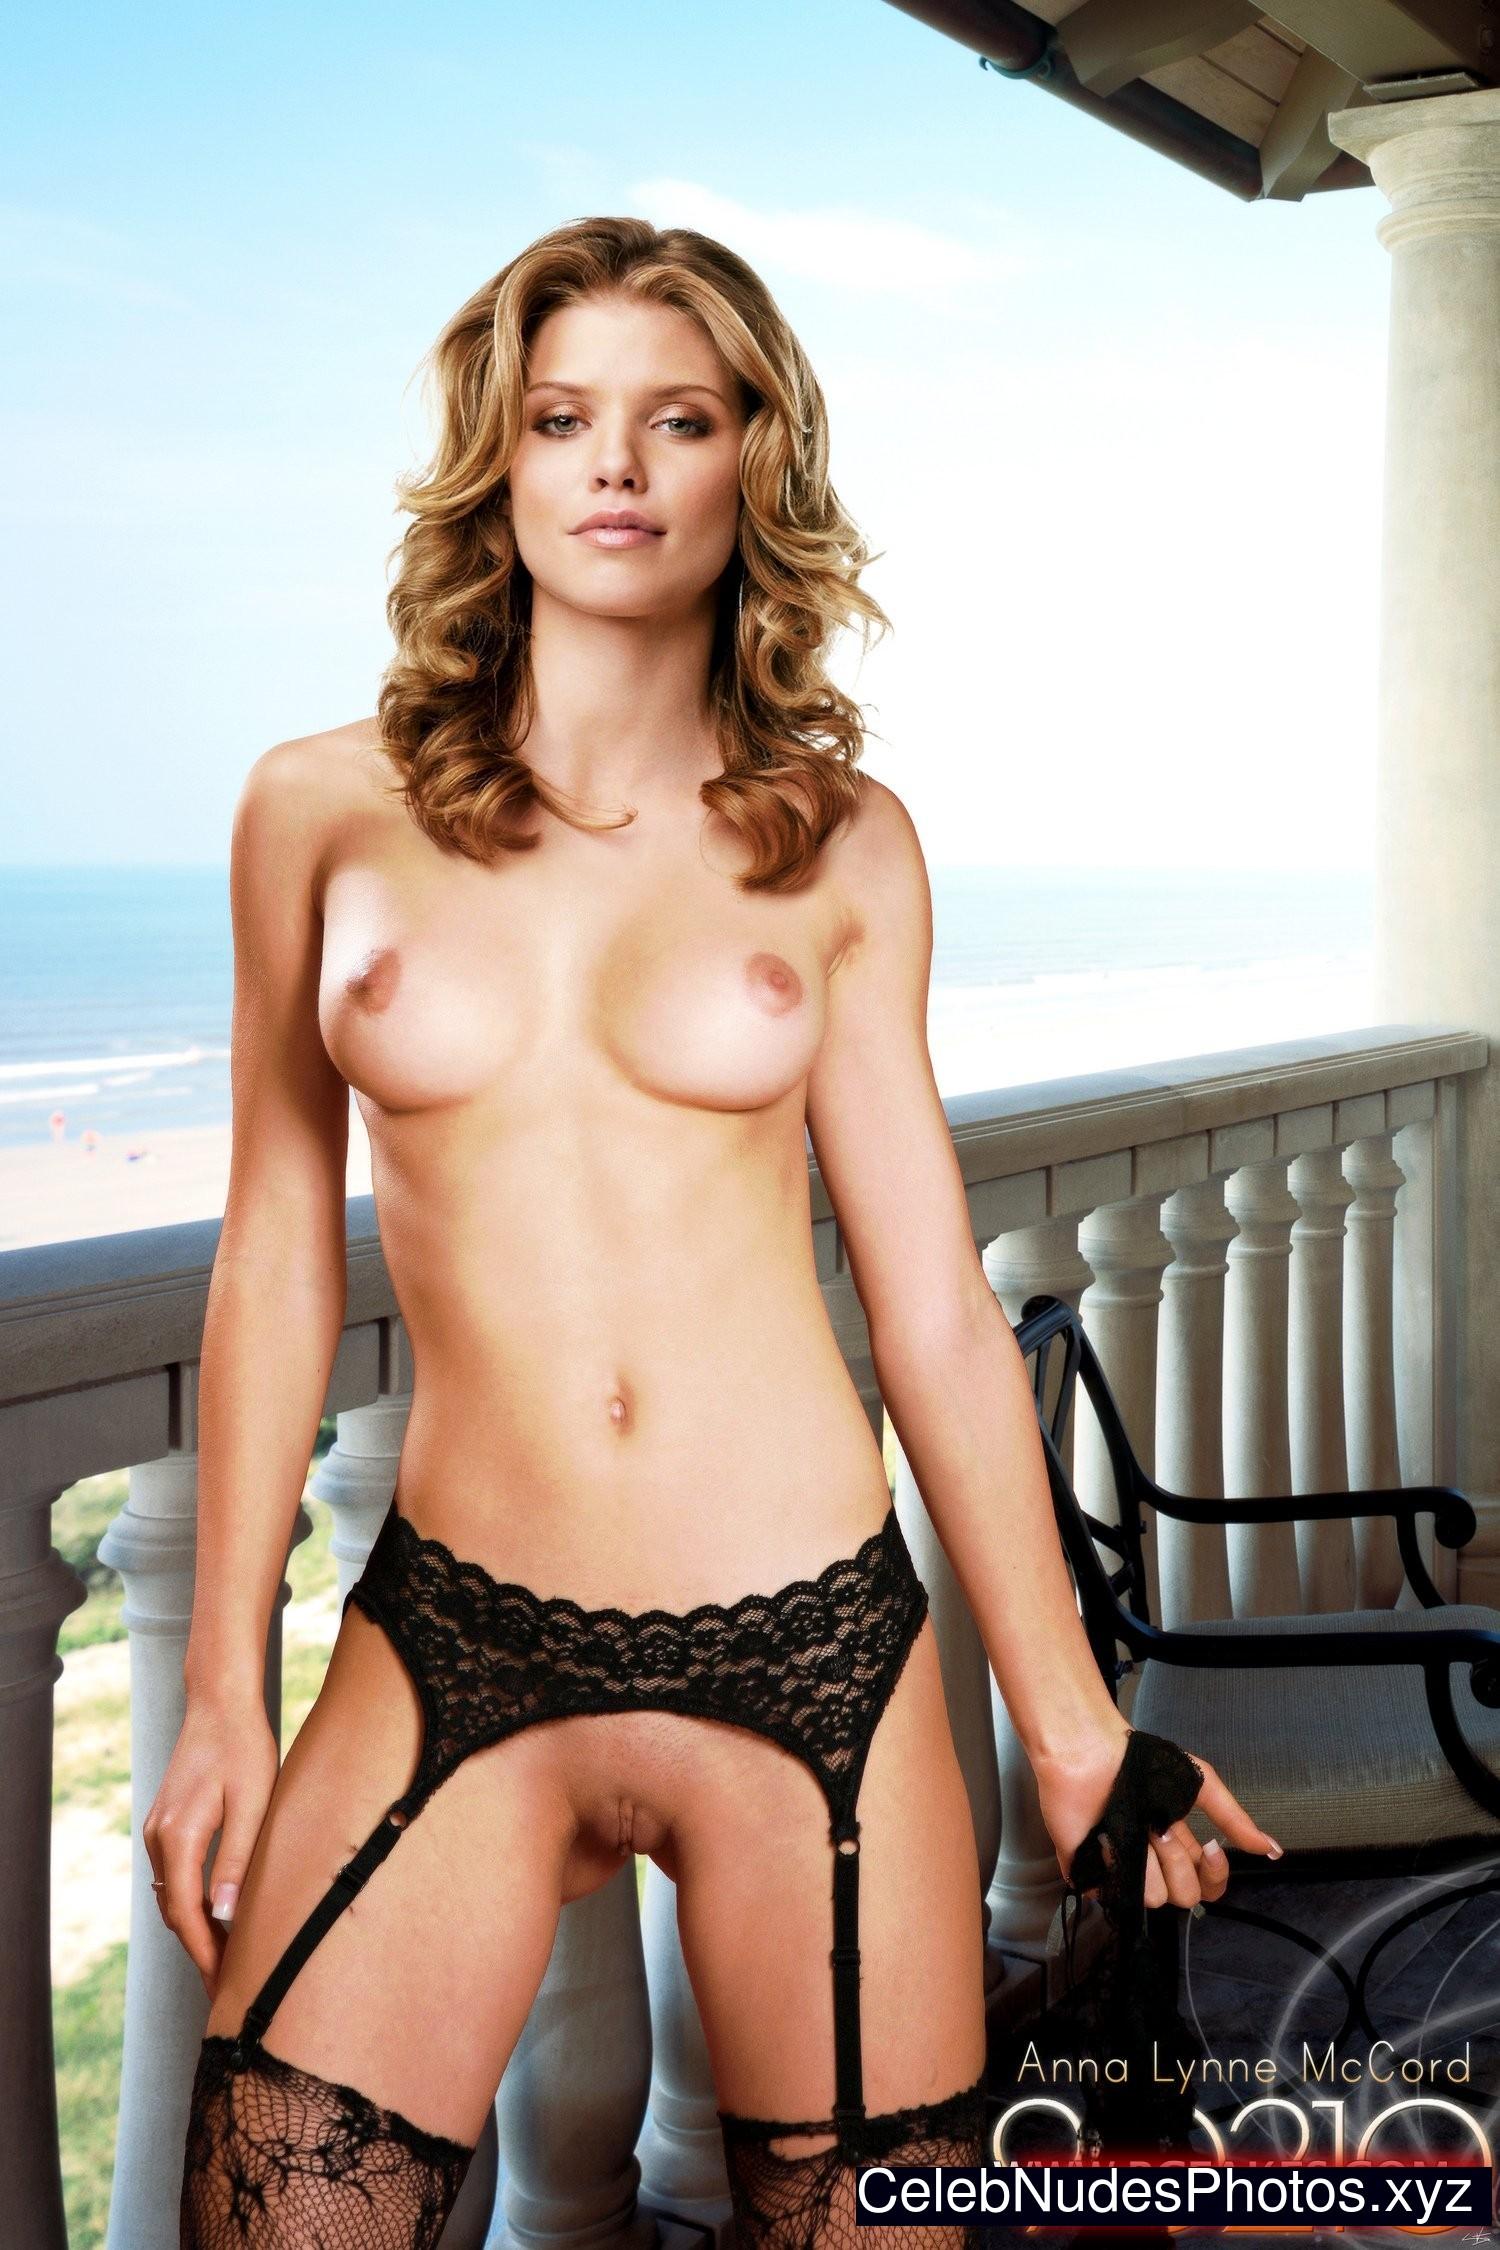 annalynne-mccord-porno-girl-with-pointy-nude-titties